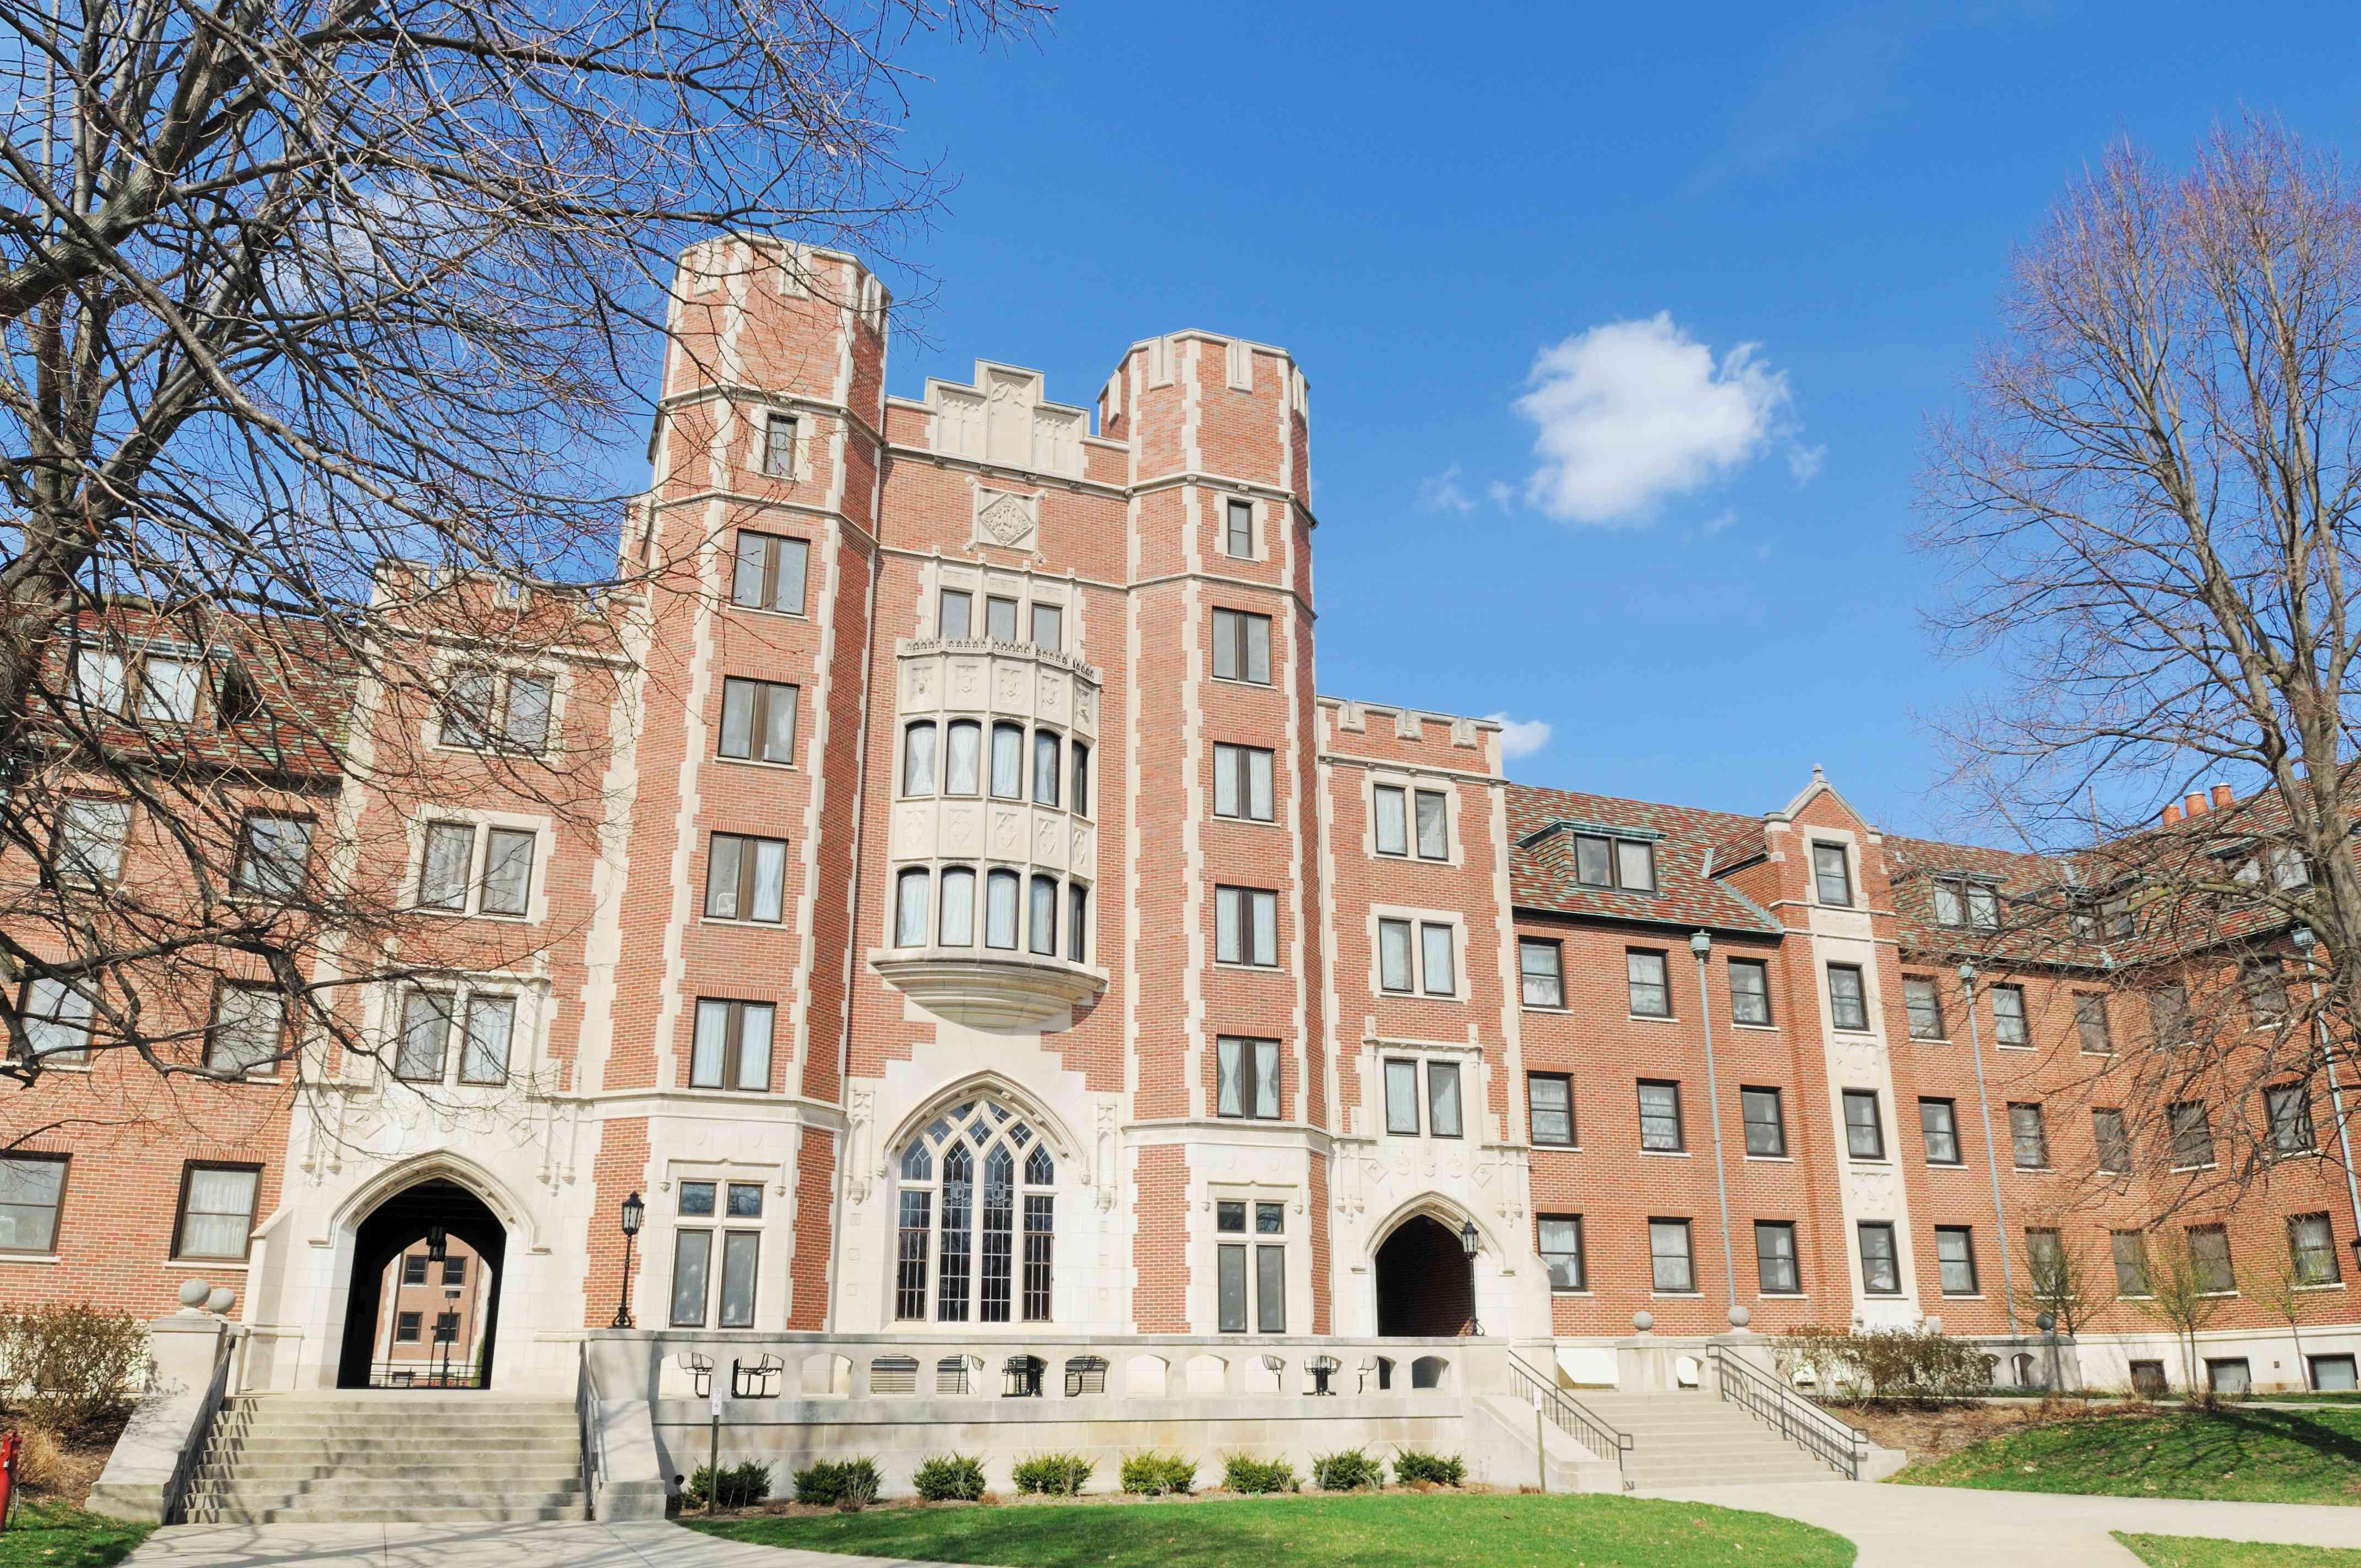 Classic Architecture Cary Quadrangle Purdue University Student Dormitory Building